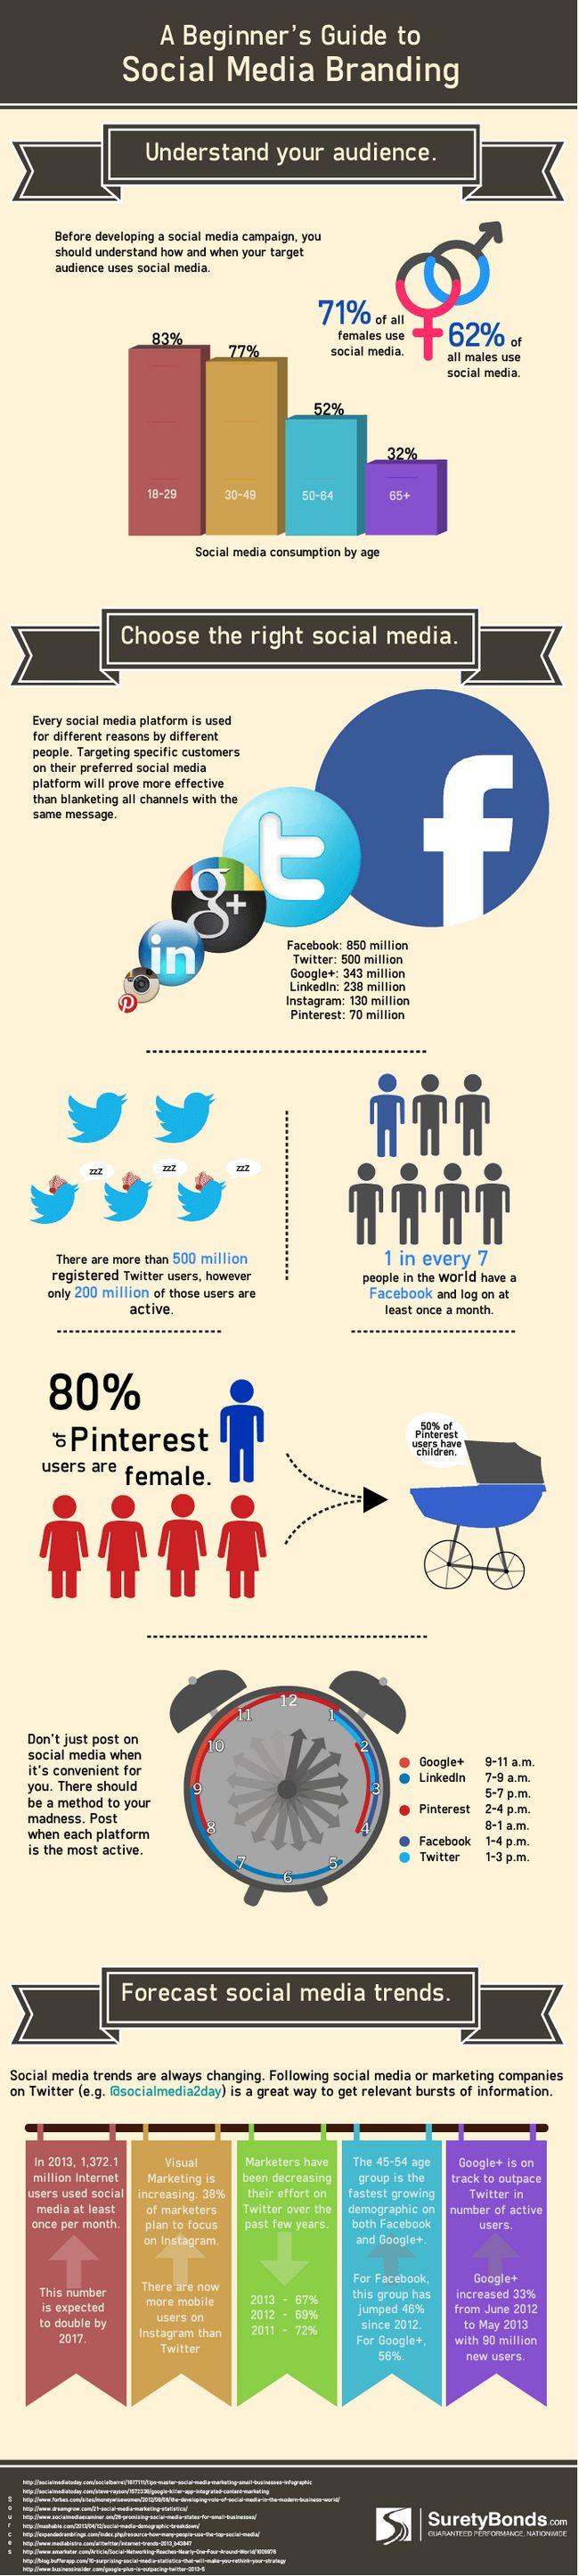 social-media-branding-guia-principiantes